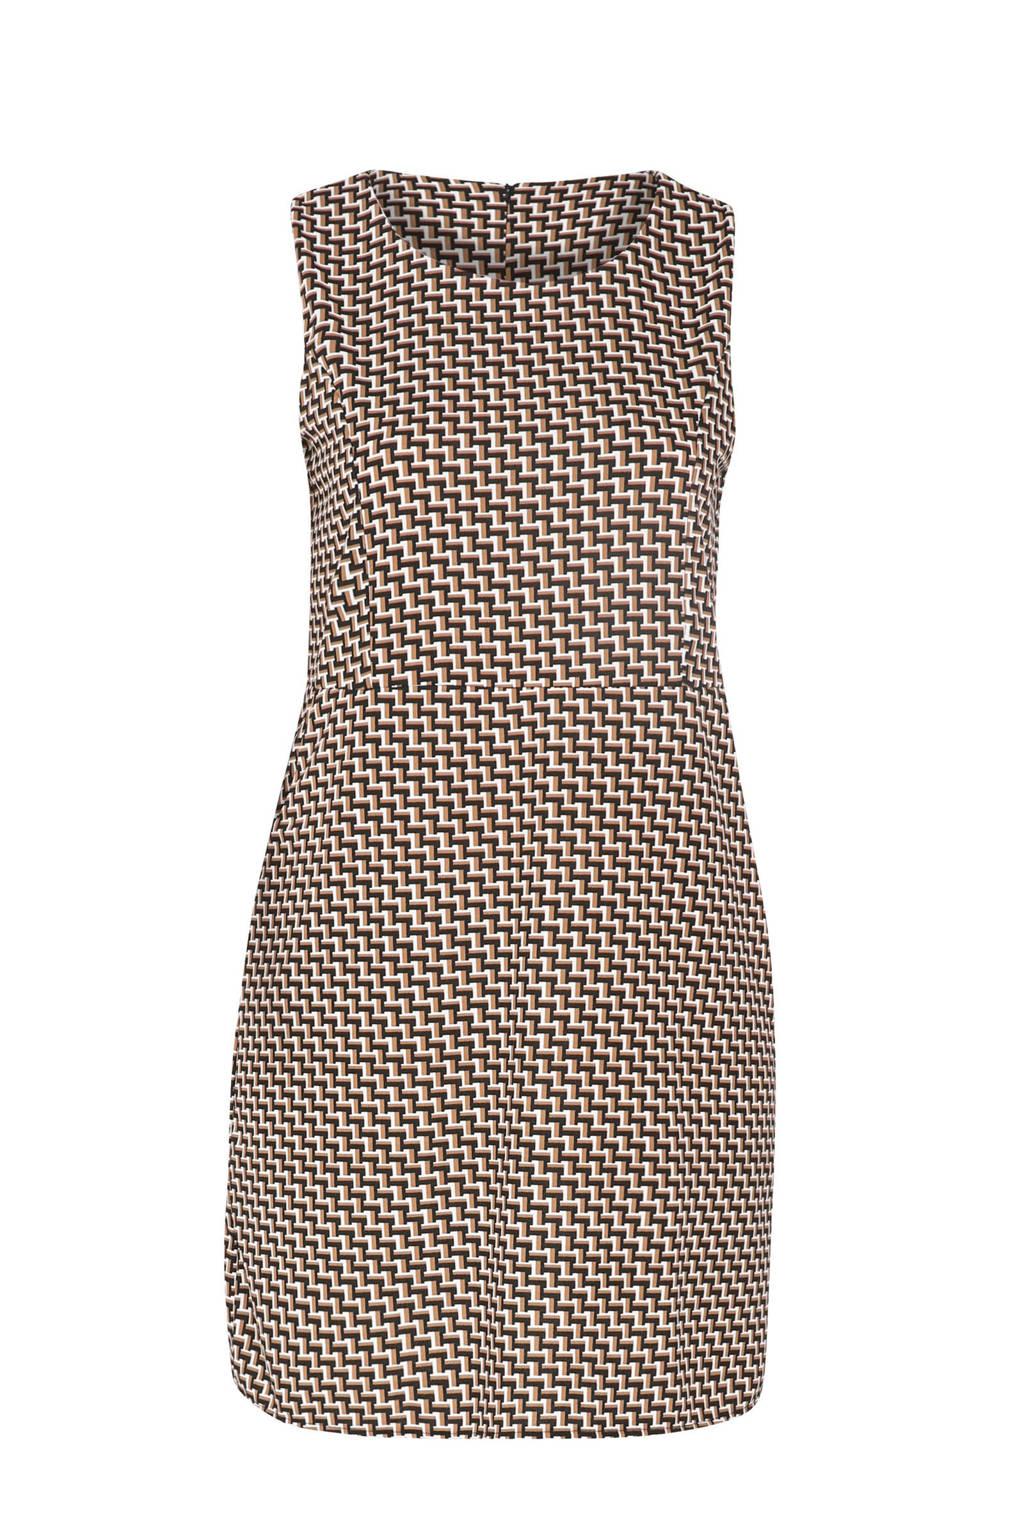 Paprika jersey jurk met grafische print zwart/bruin/wit, Zwart/bruin/wit